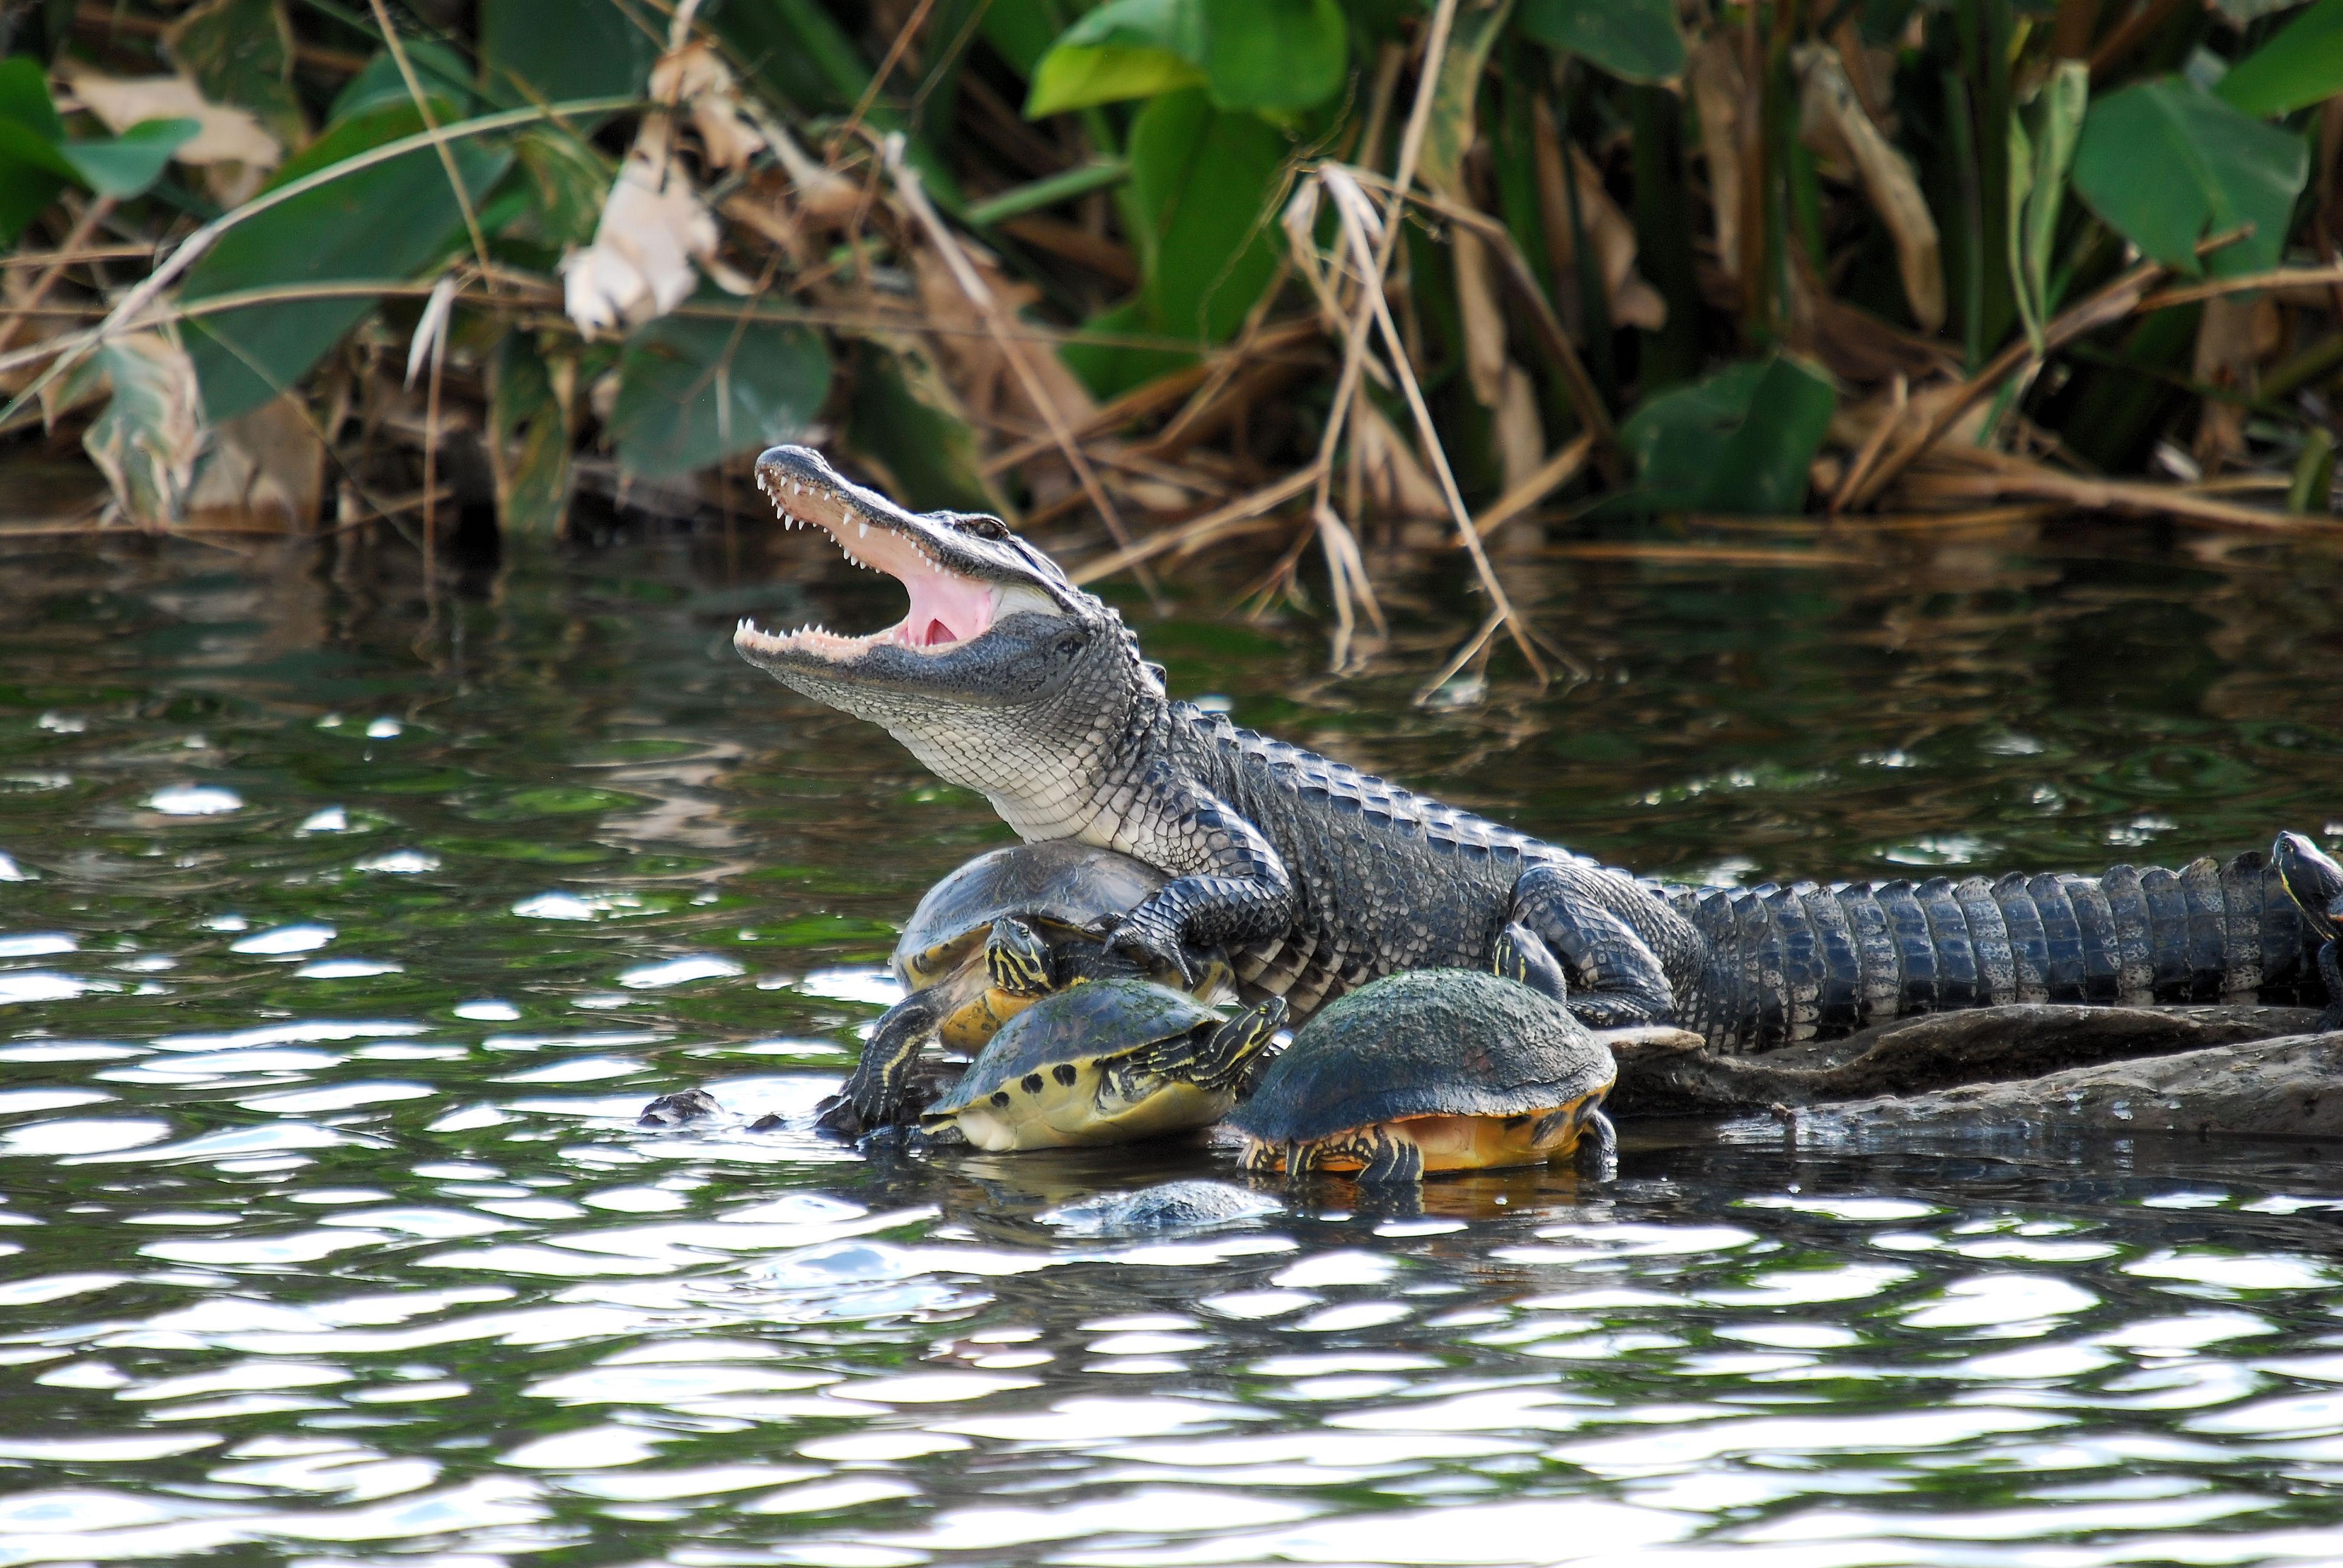 Turtle Collector, Alligator, Animal, Florida, Gator, HQ Photo